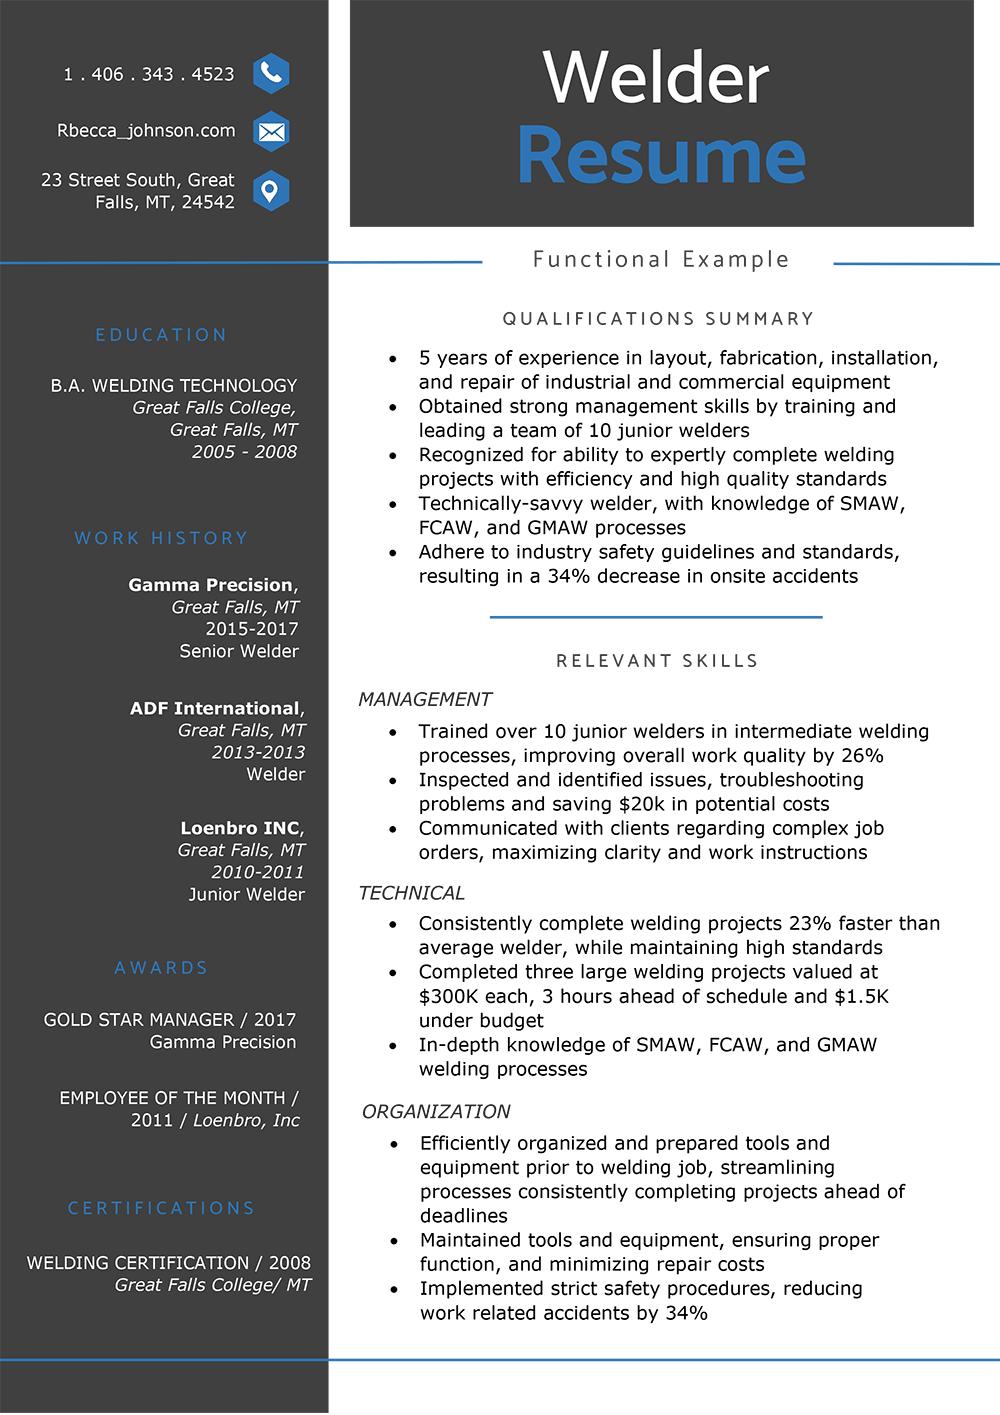 How To Write Resume Functional Welder Resume Sample how to write resume|wikiresume.com